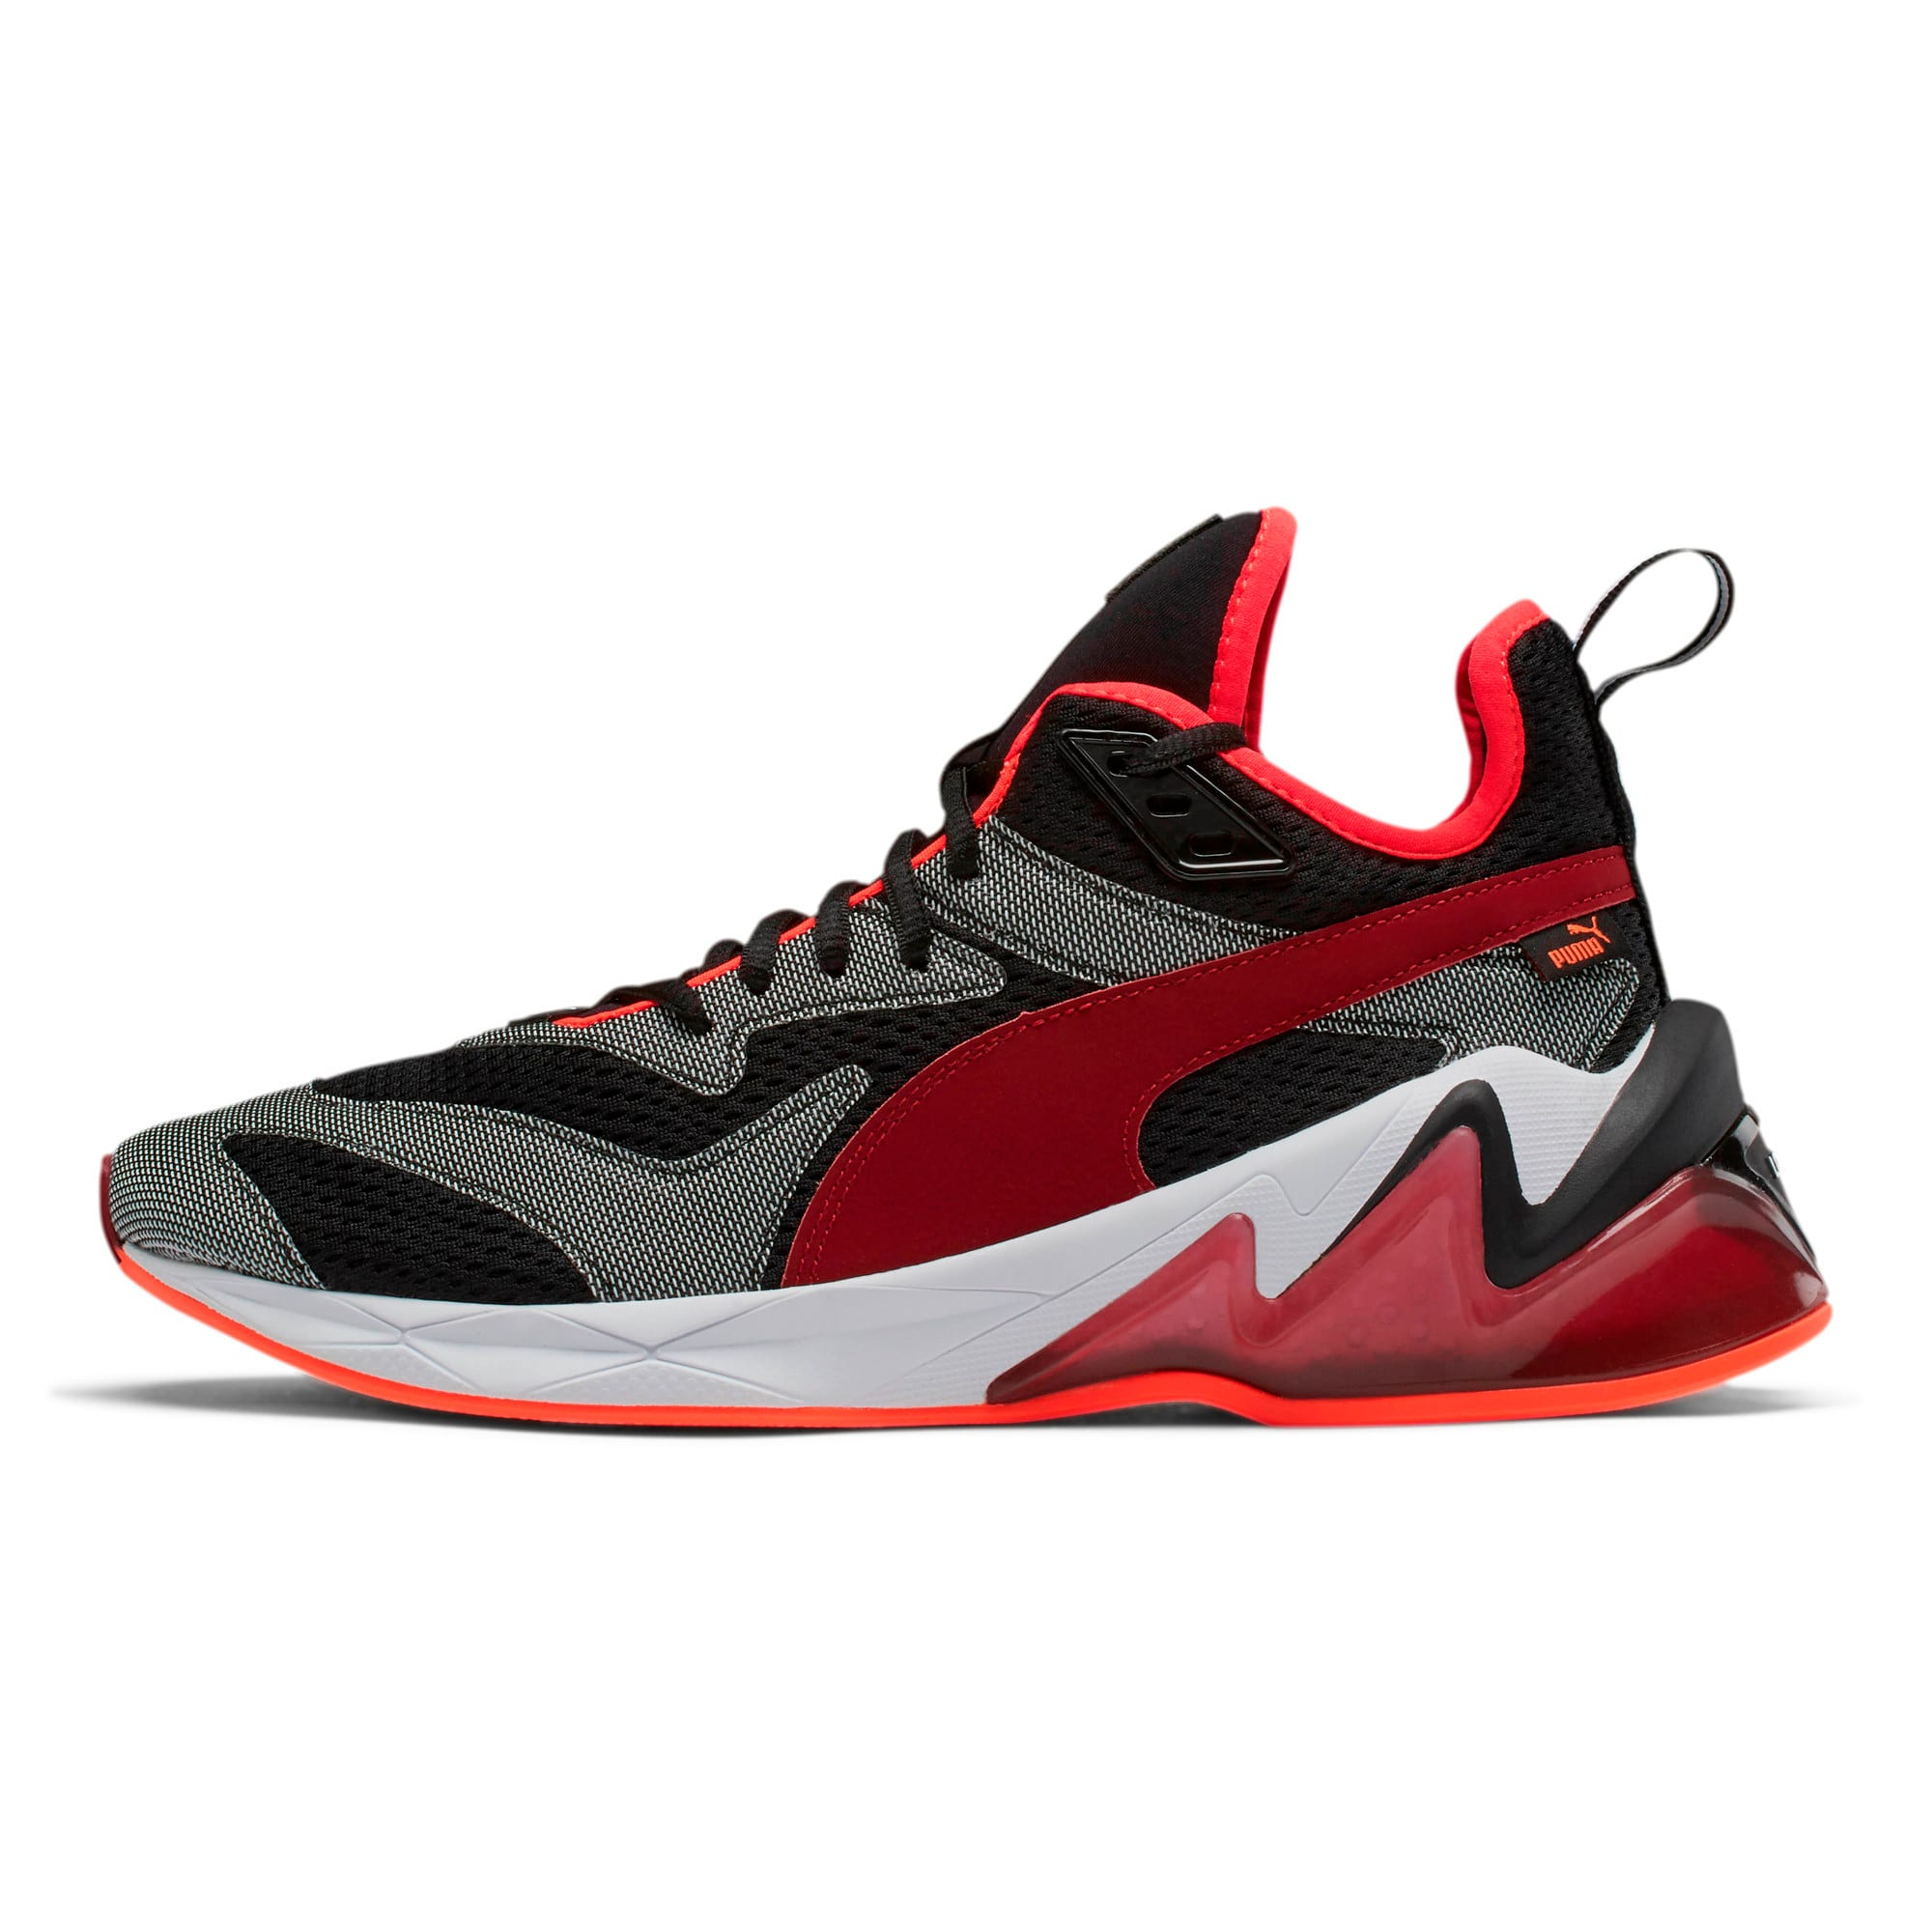 Thumbnail 1 of LQDCELL Origin Tech Men's Training Shoes, Puma Black-Rhubarb, medium